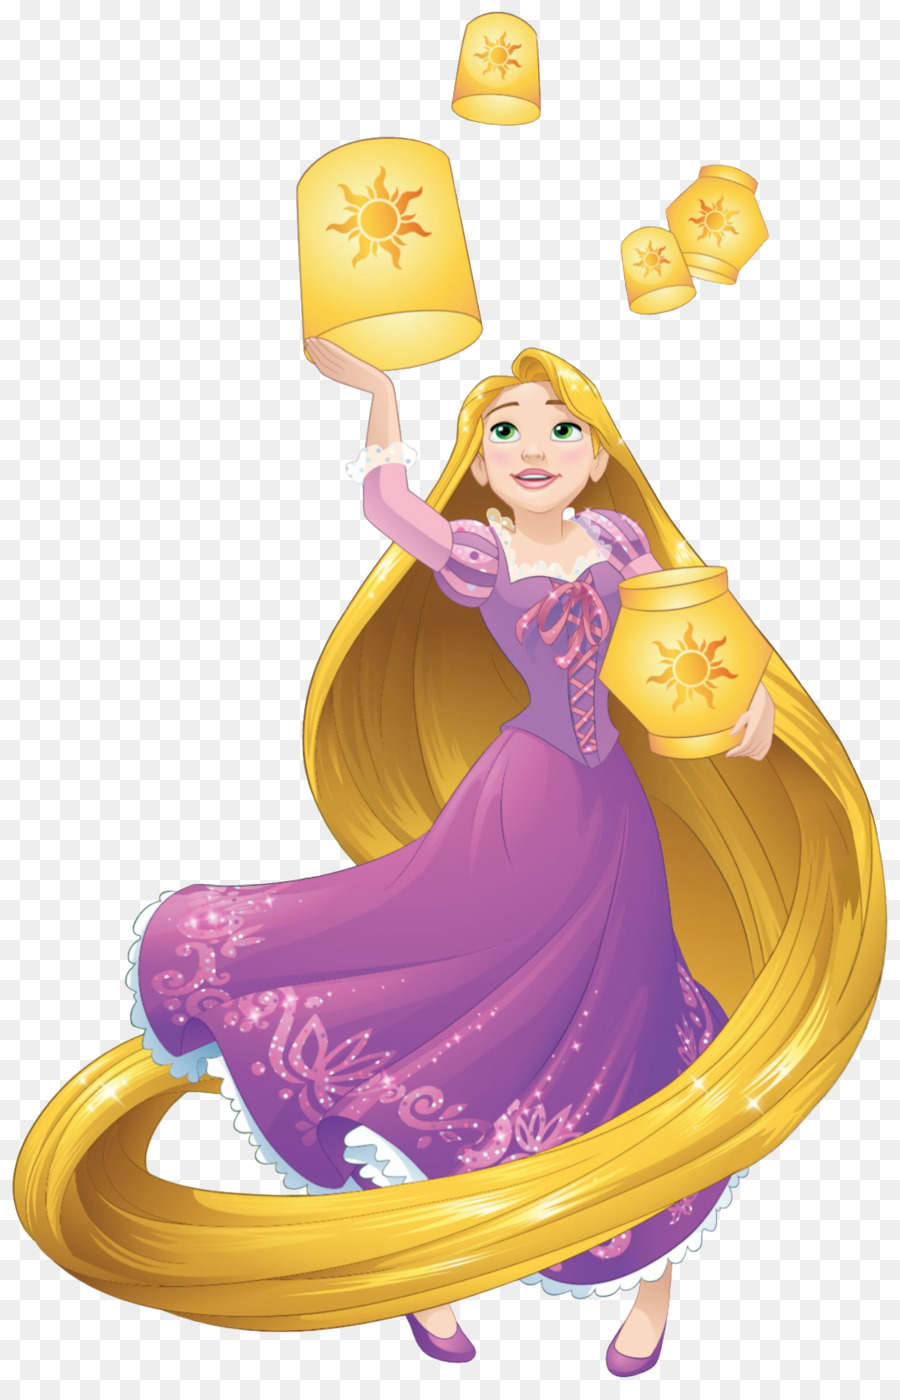 Rapunzel Wall Decal The Walt Disney Company Sticker